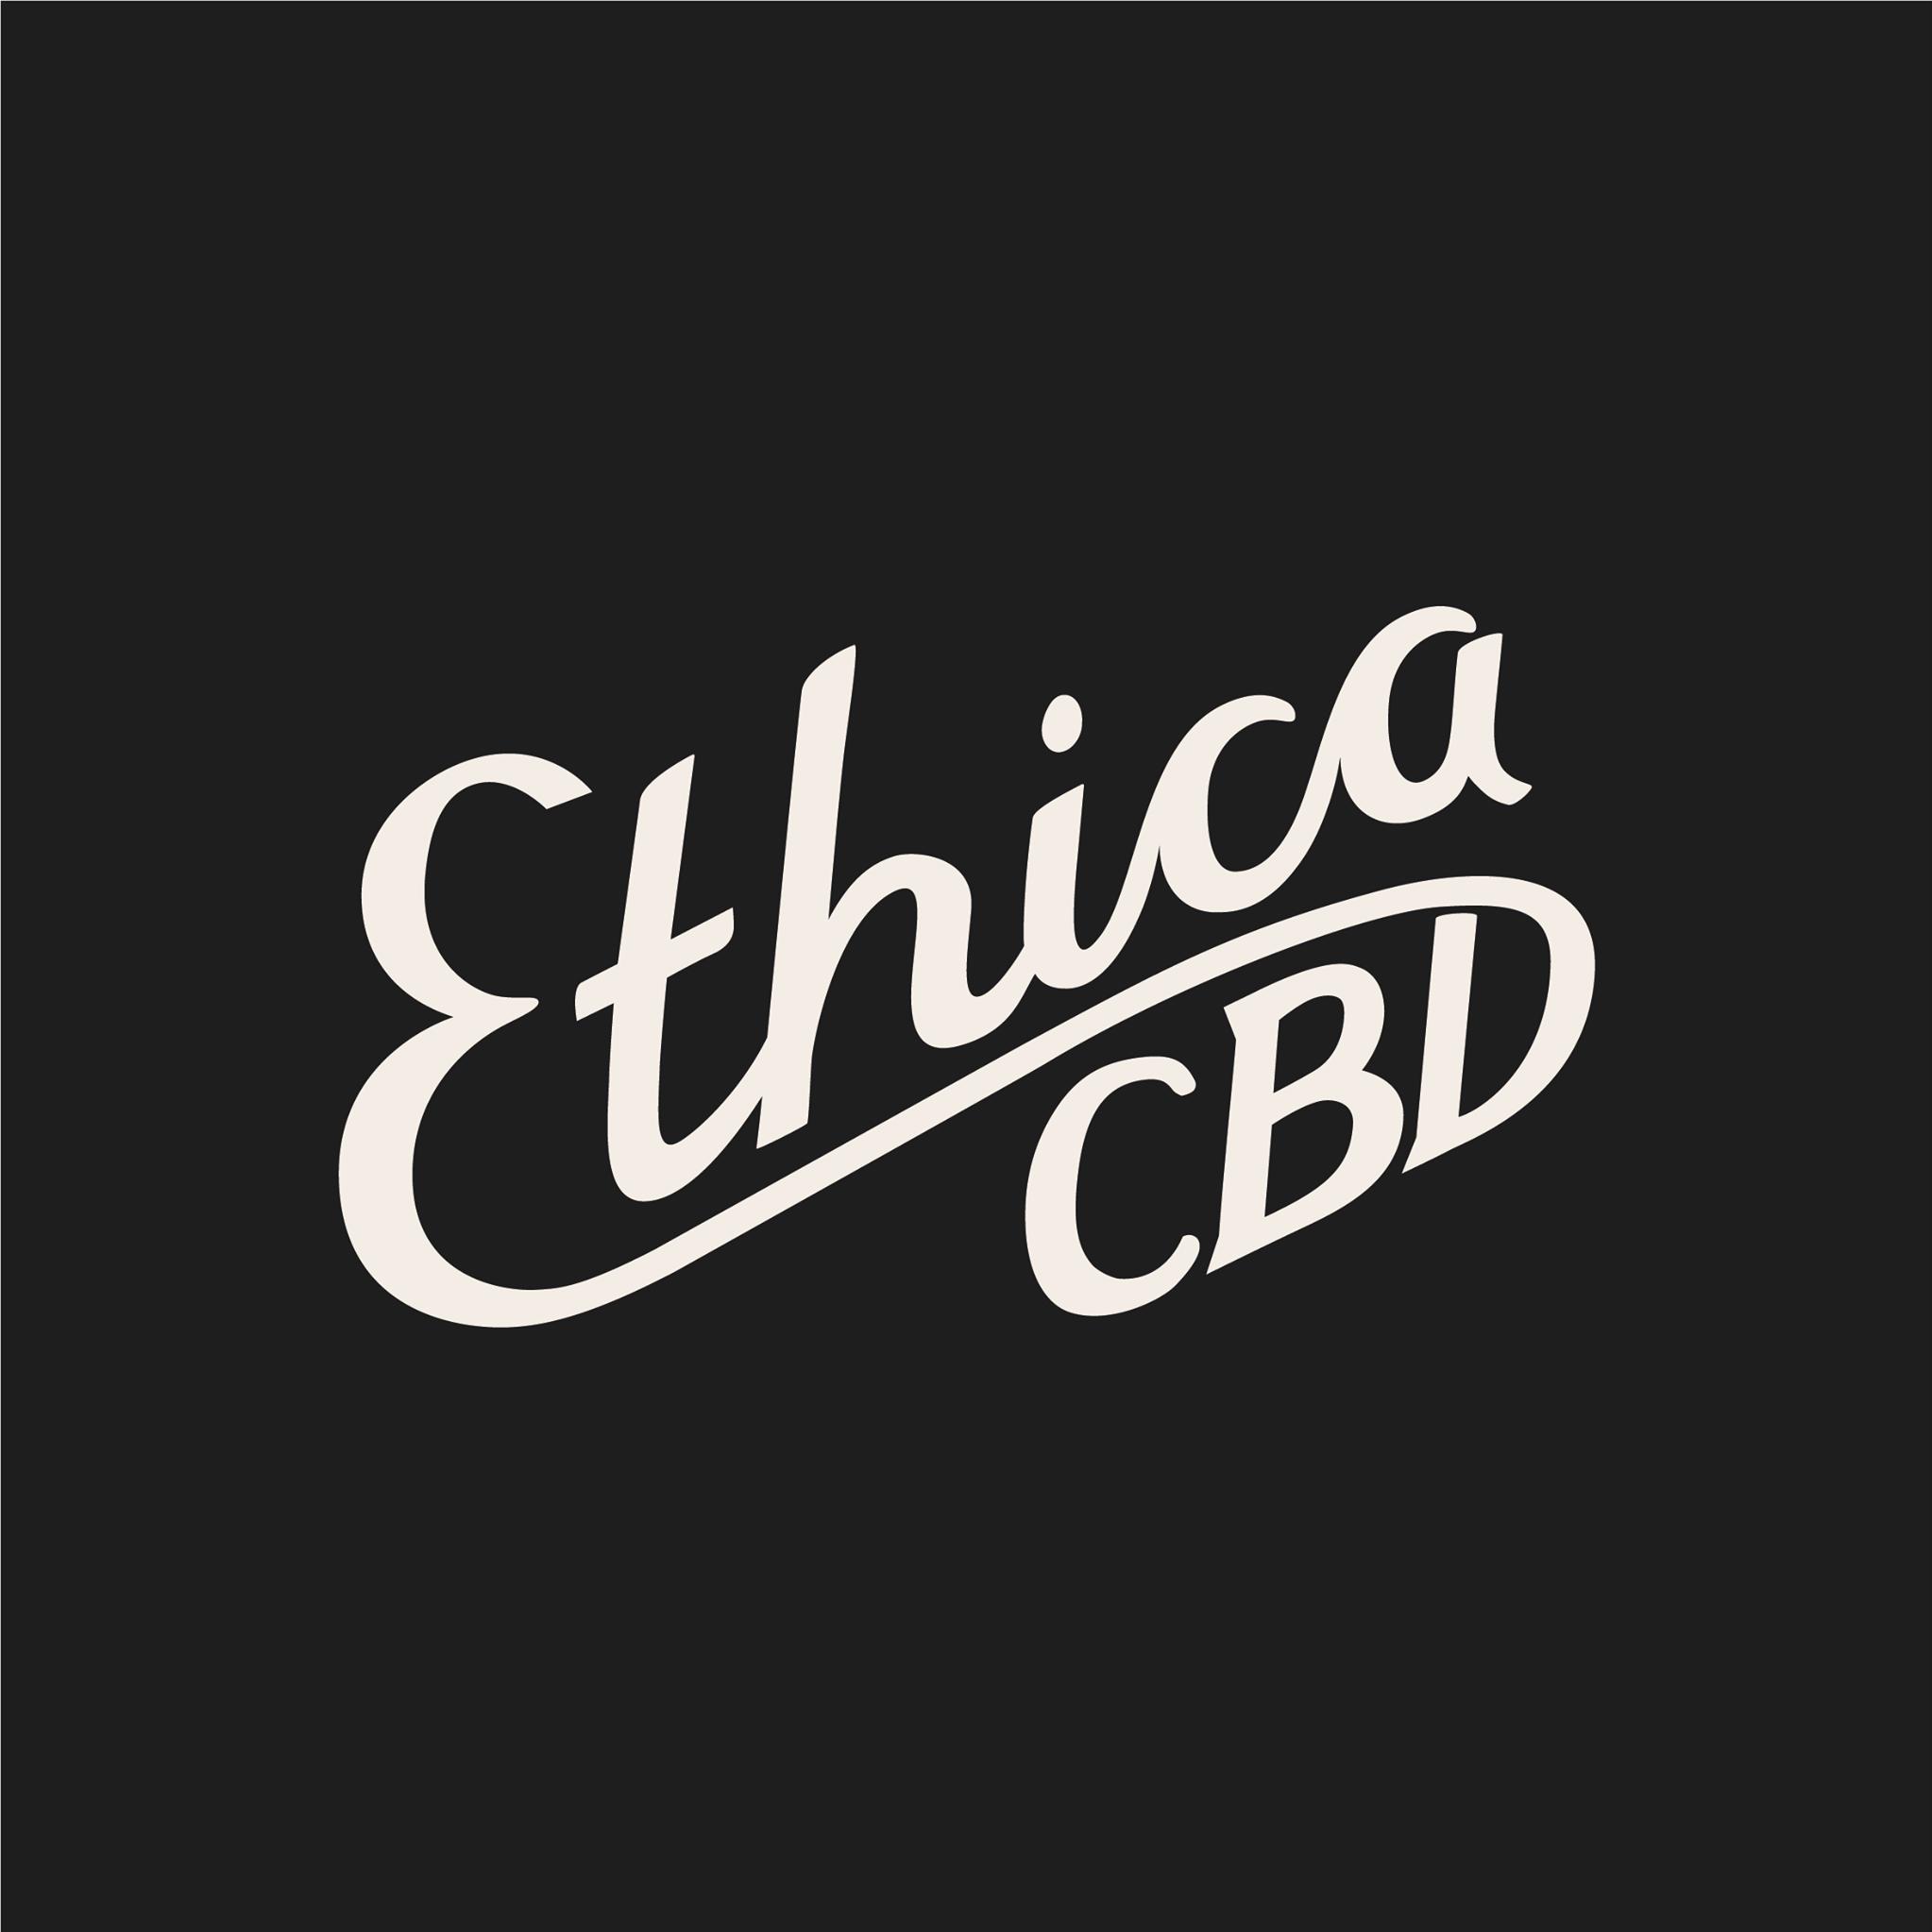 Ethica CDB (SNS)